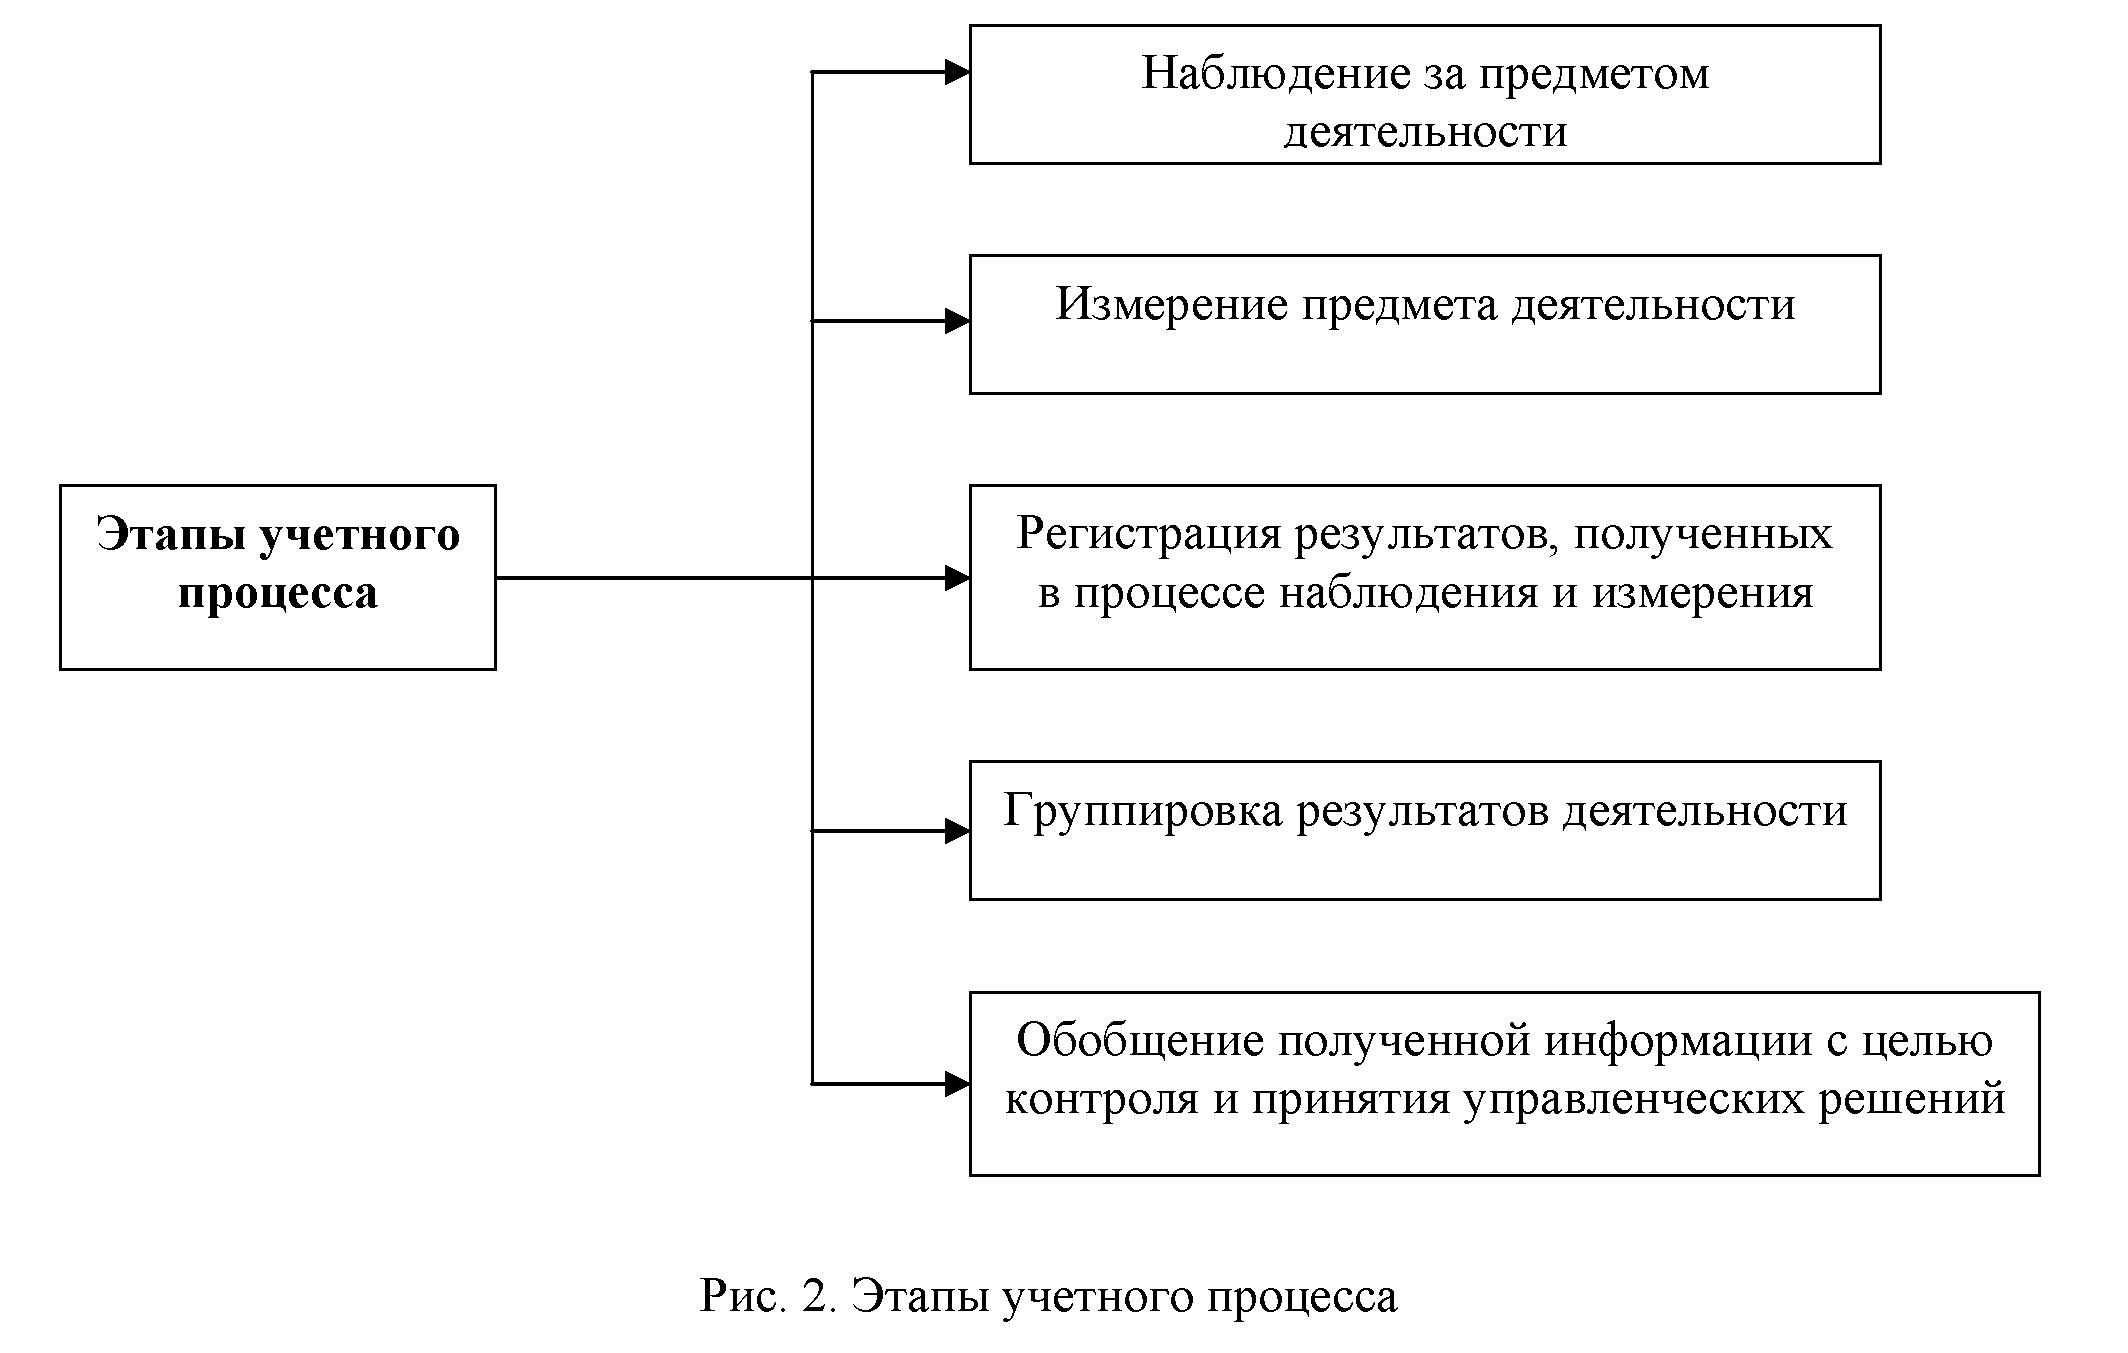 характеристика и направления совершенствования в бухучете